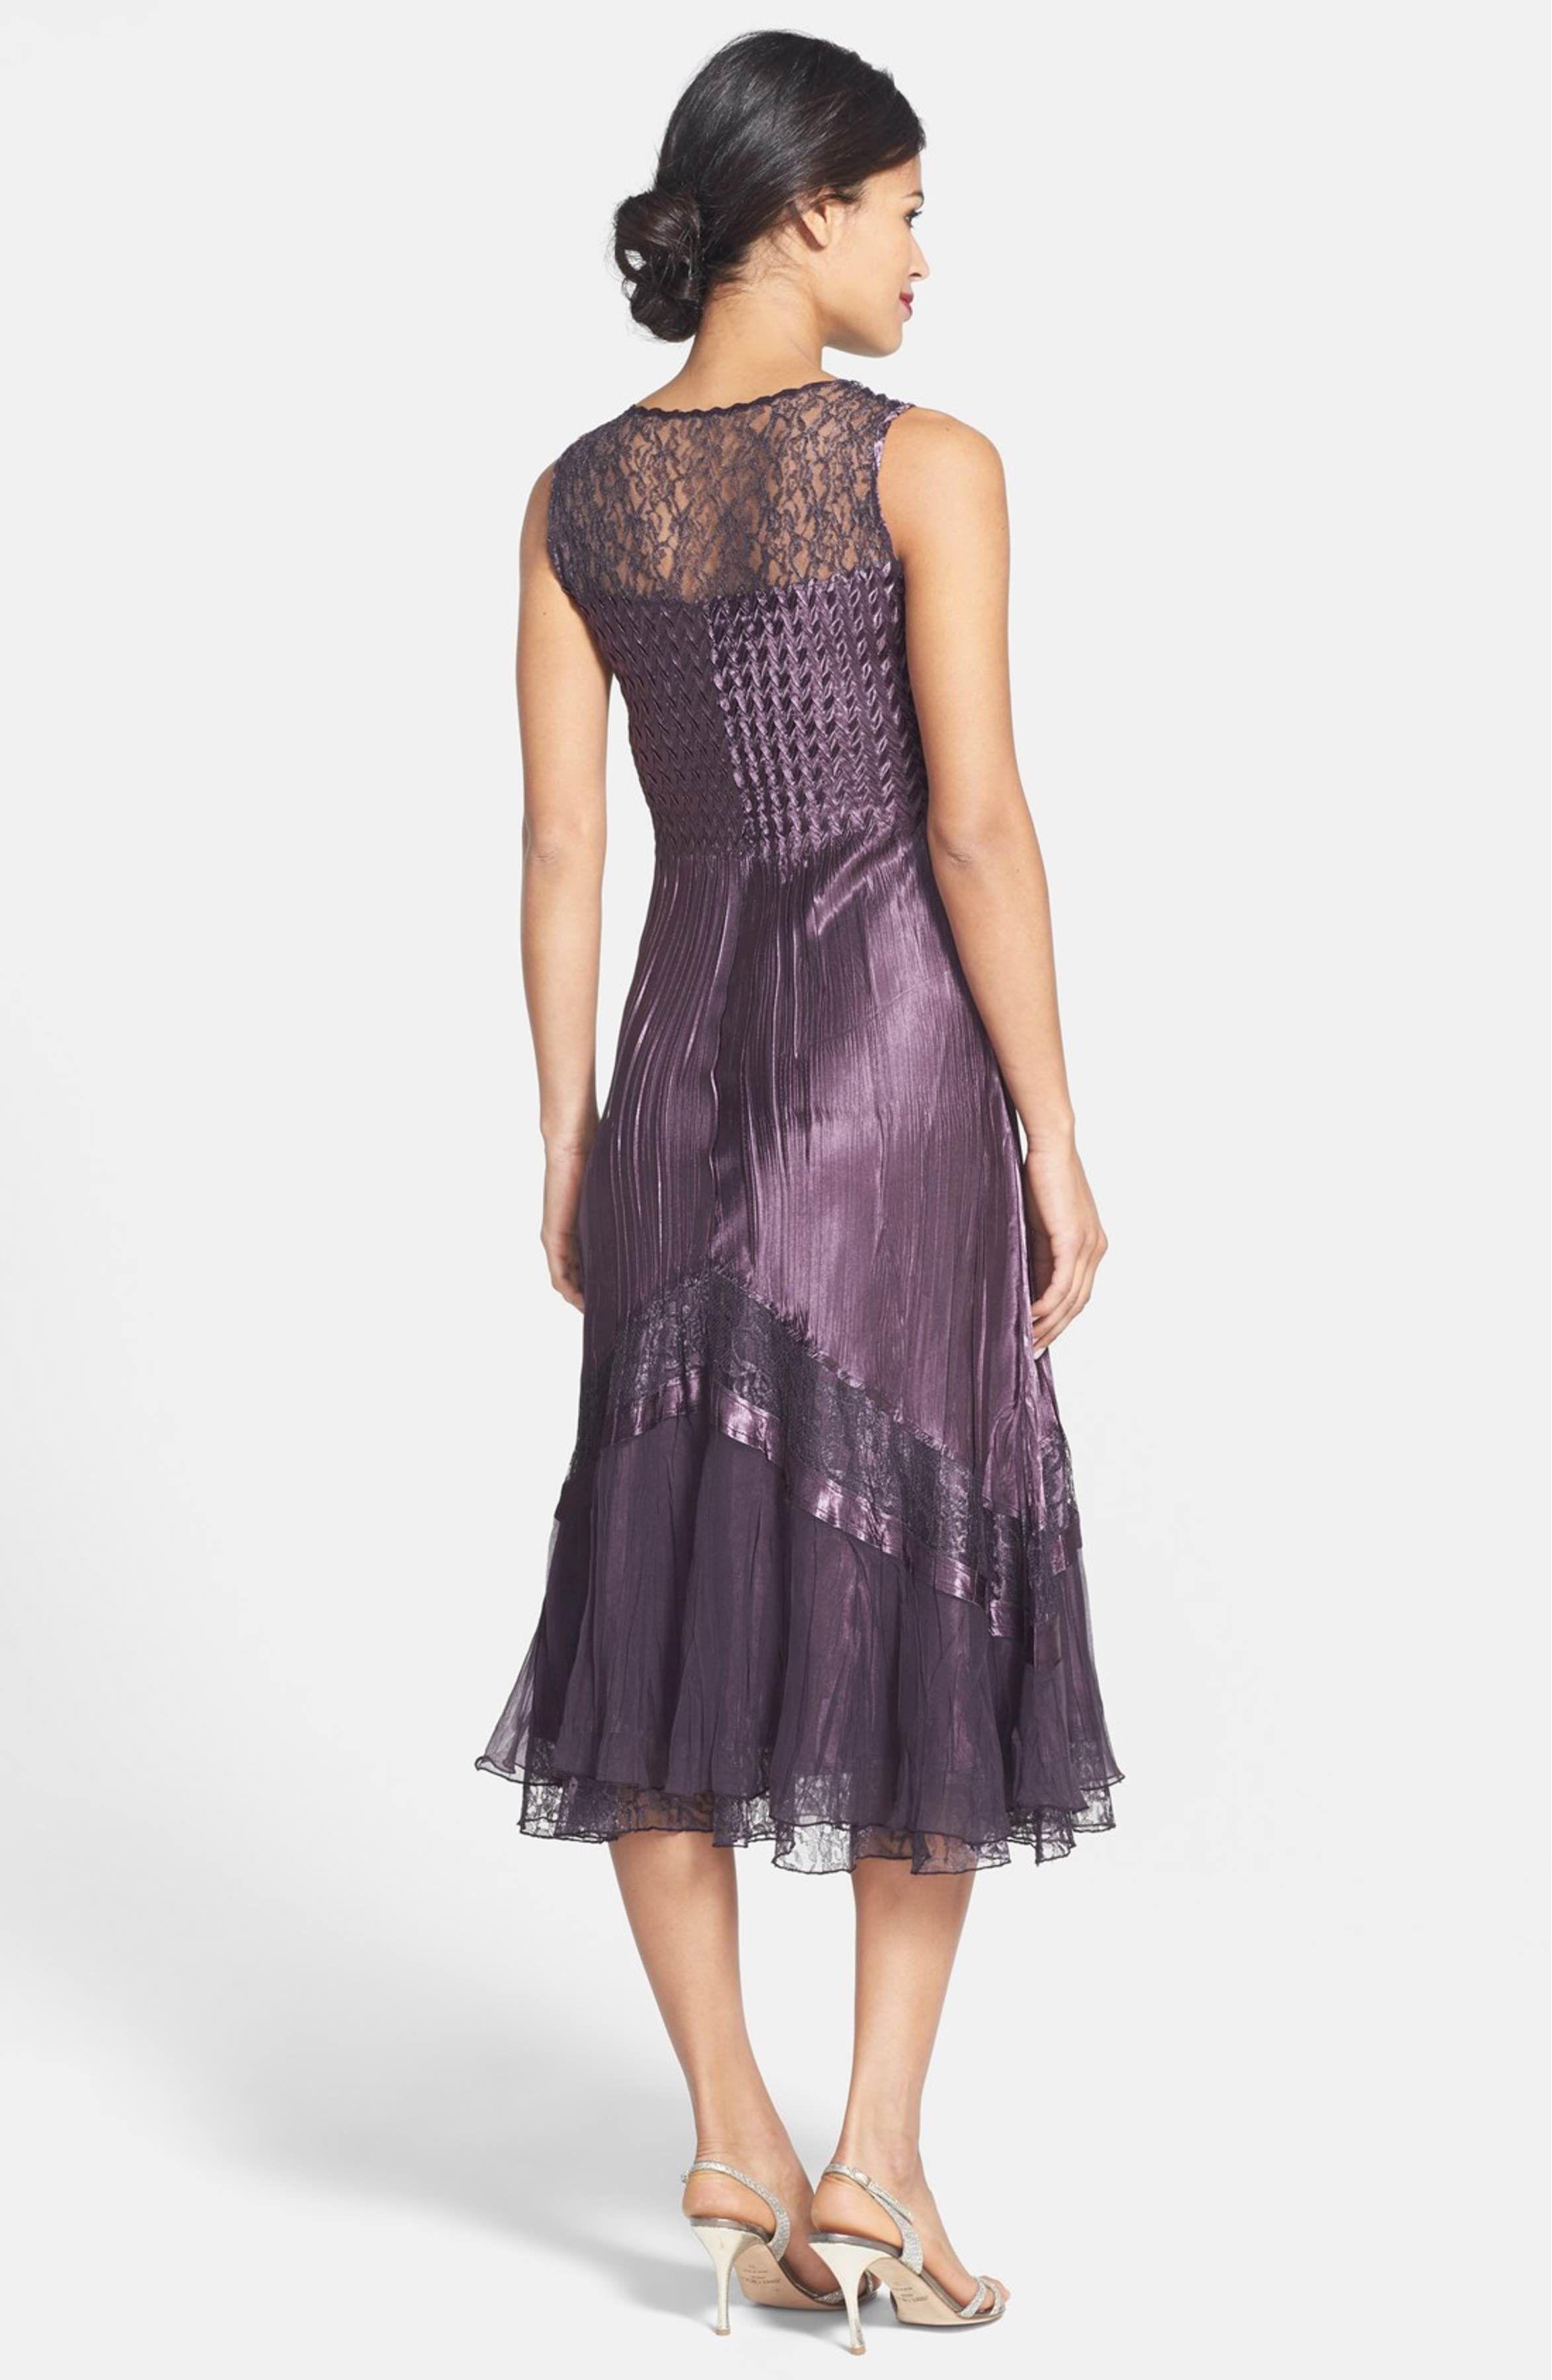 Encantador Nordstrom Vestidos De Boda Motivo - Vestido de Novia Para ...